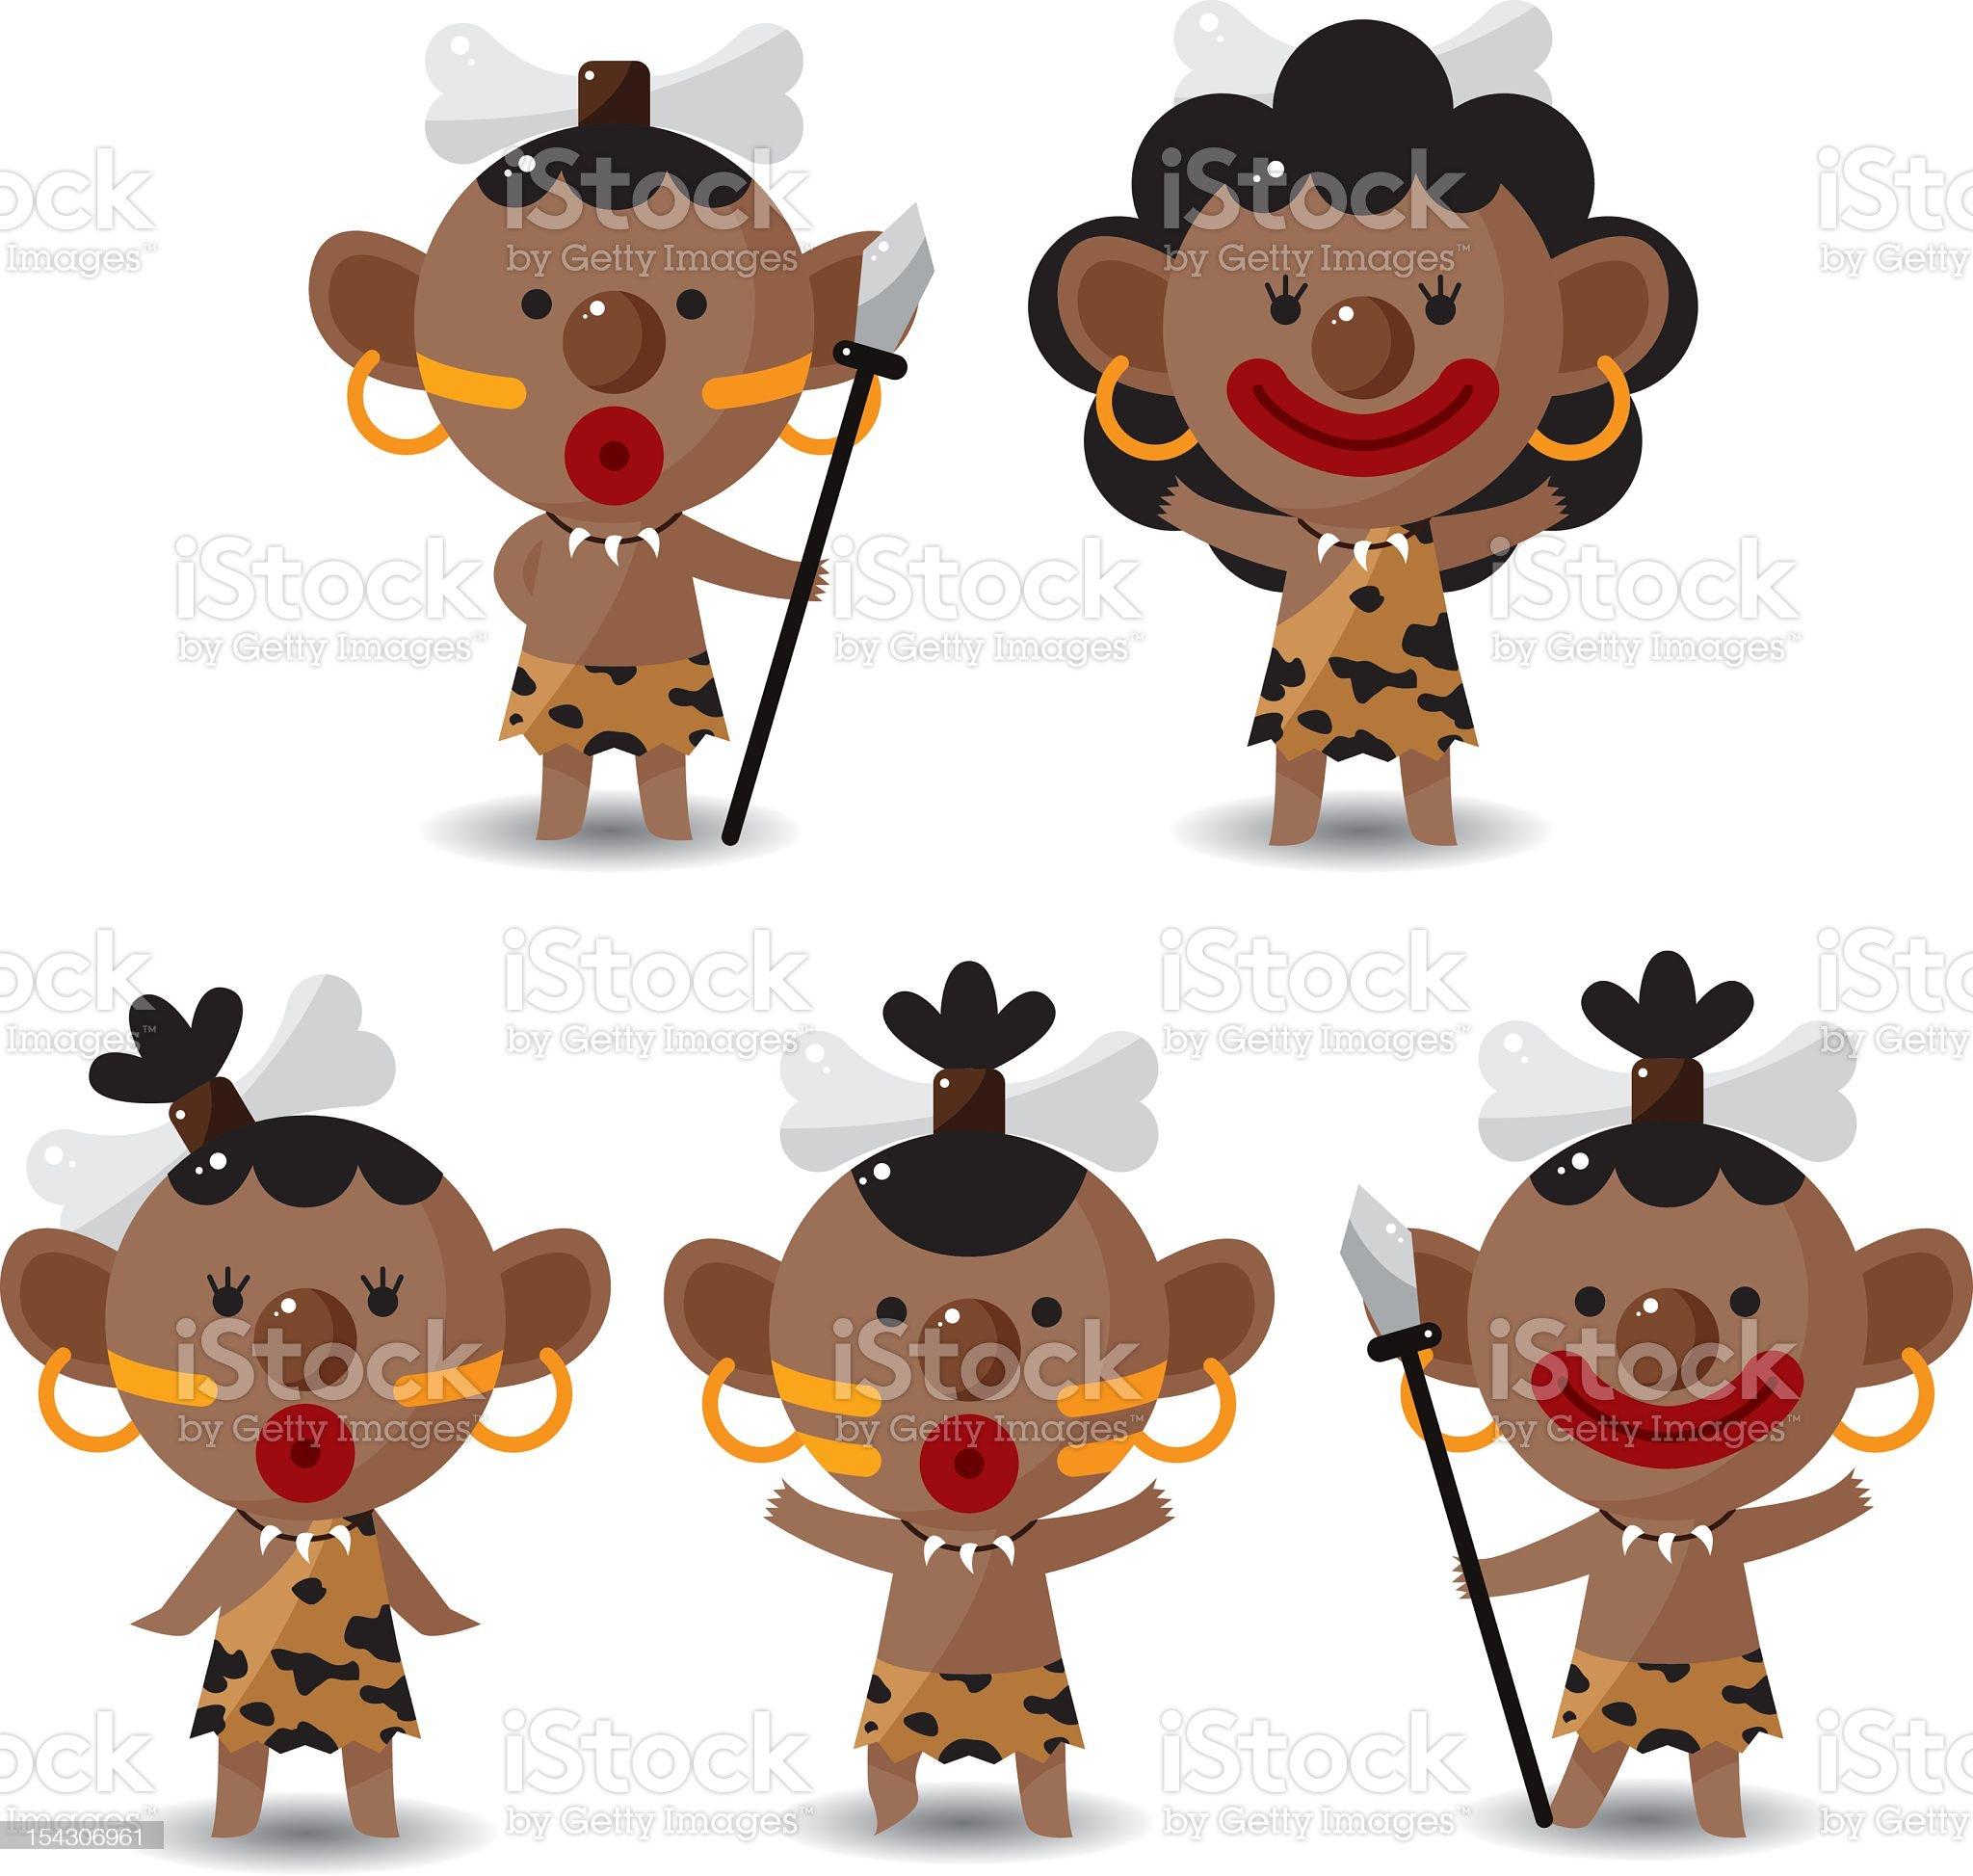 set of Indigenous people royalty-free stock photo